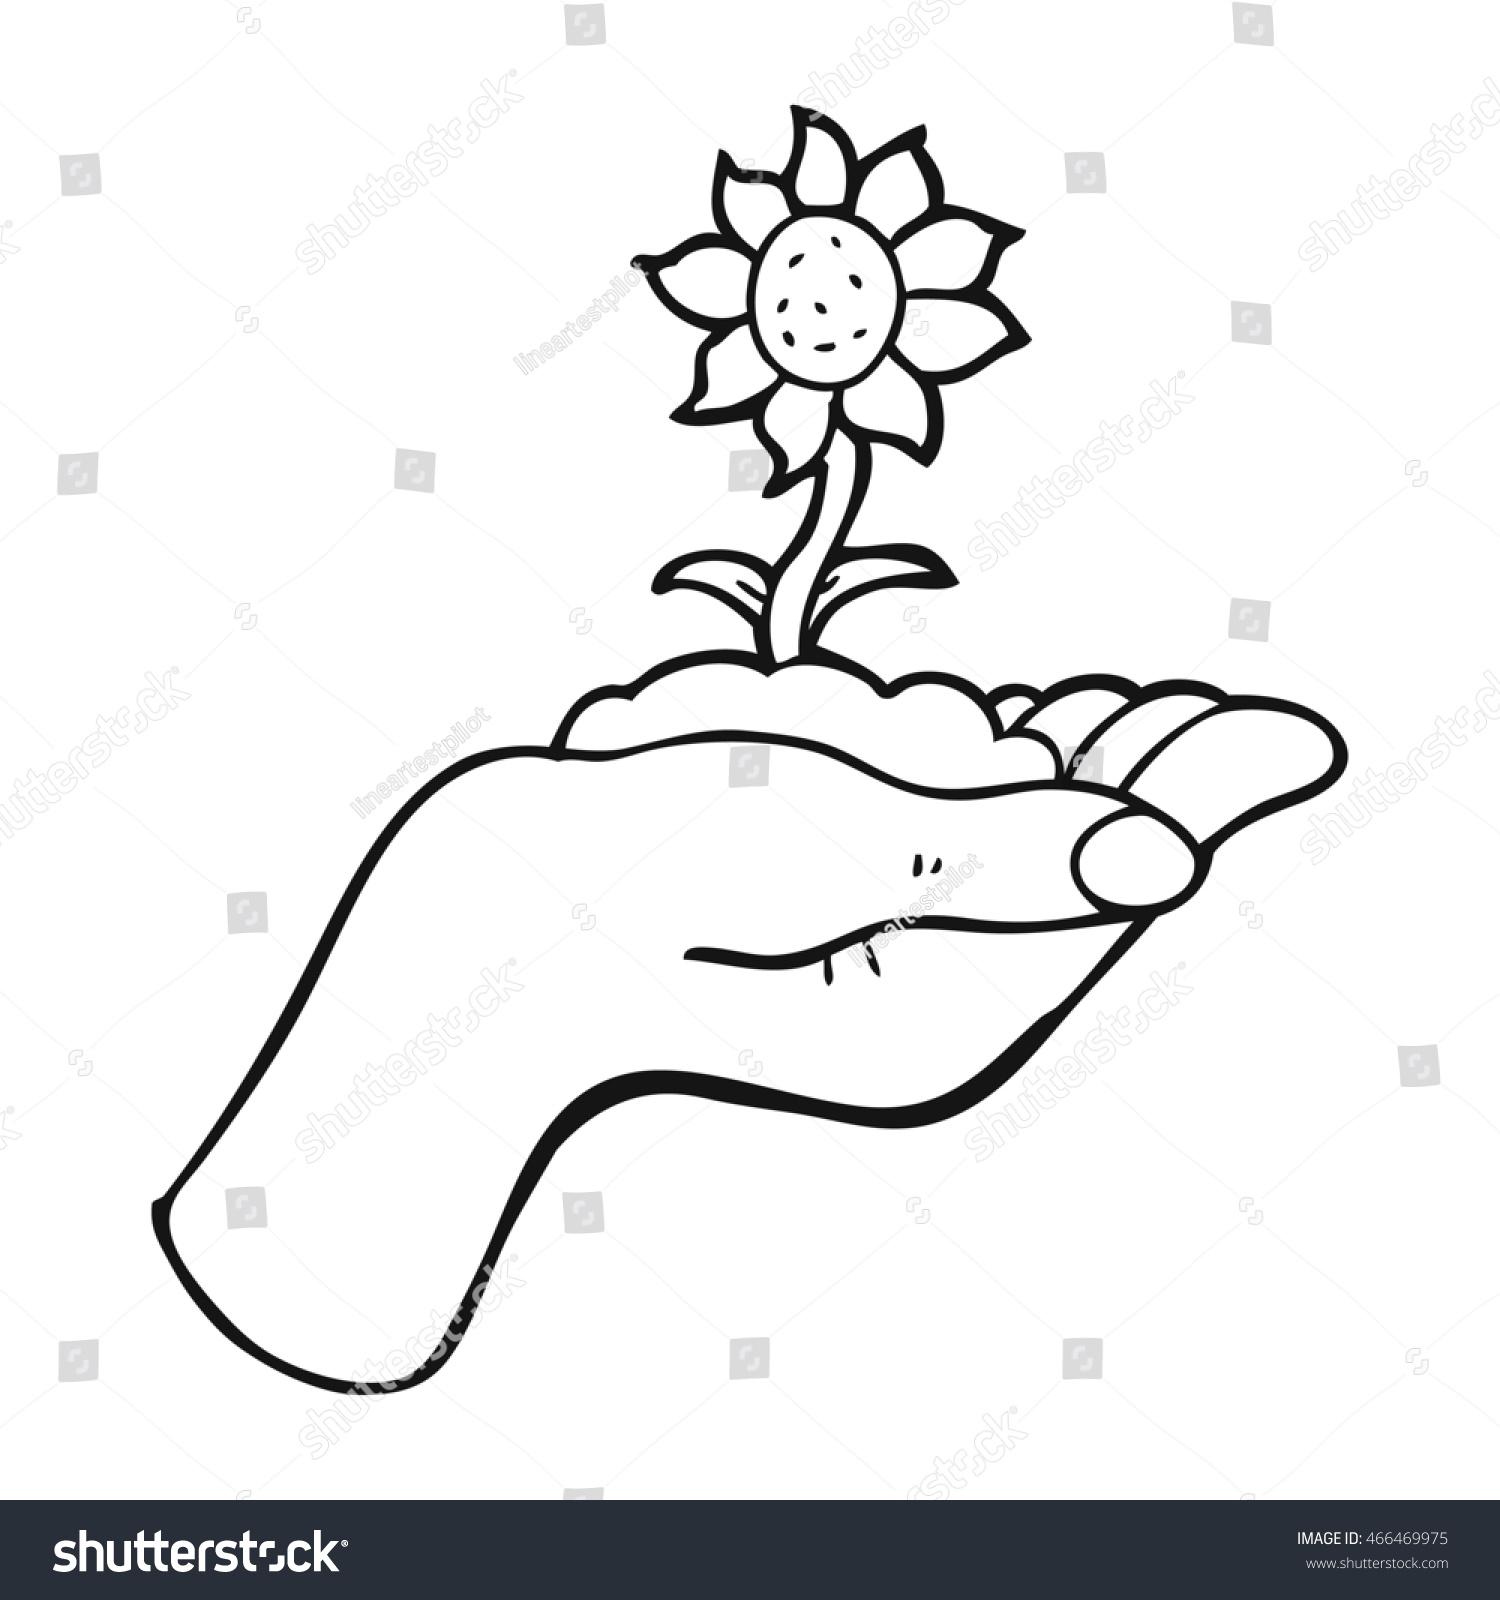 Freehand Drawn Black White Cartoon Flower Stock Illustration